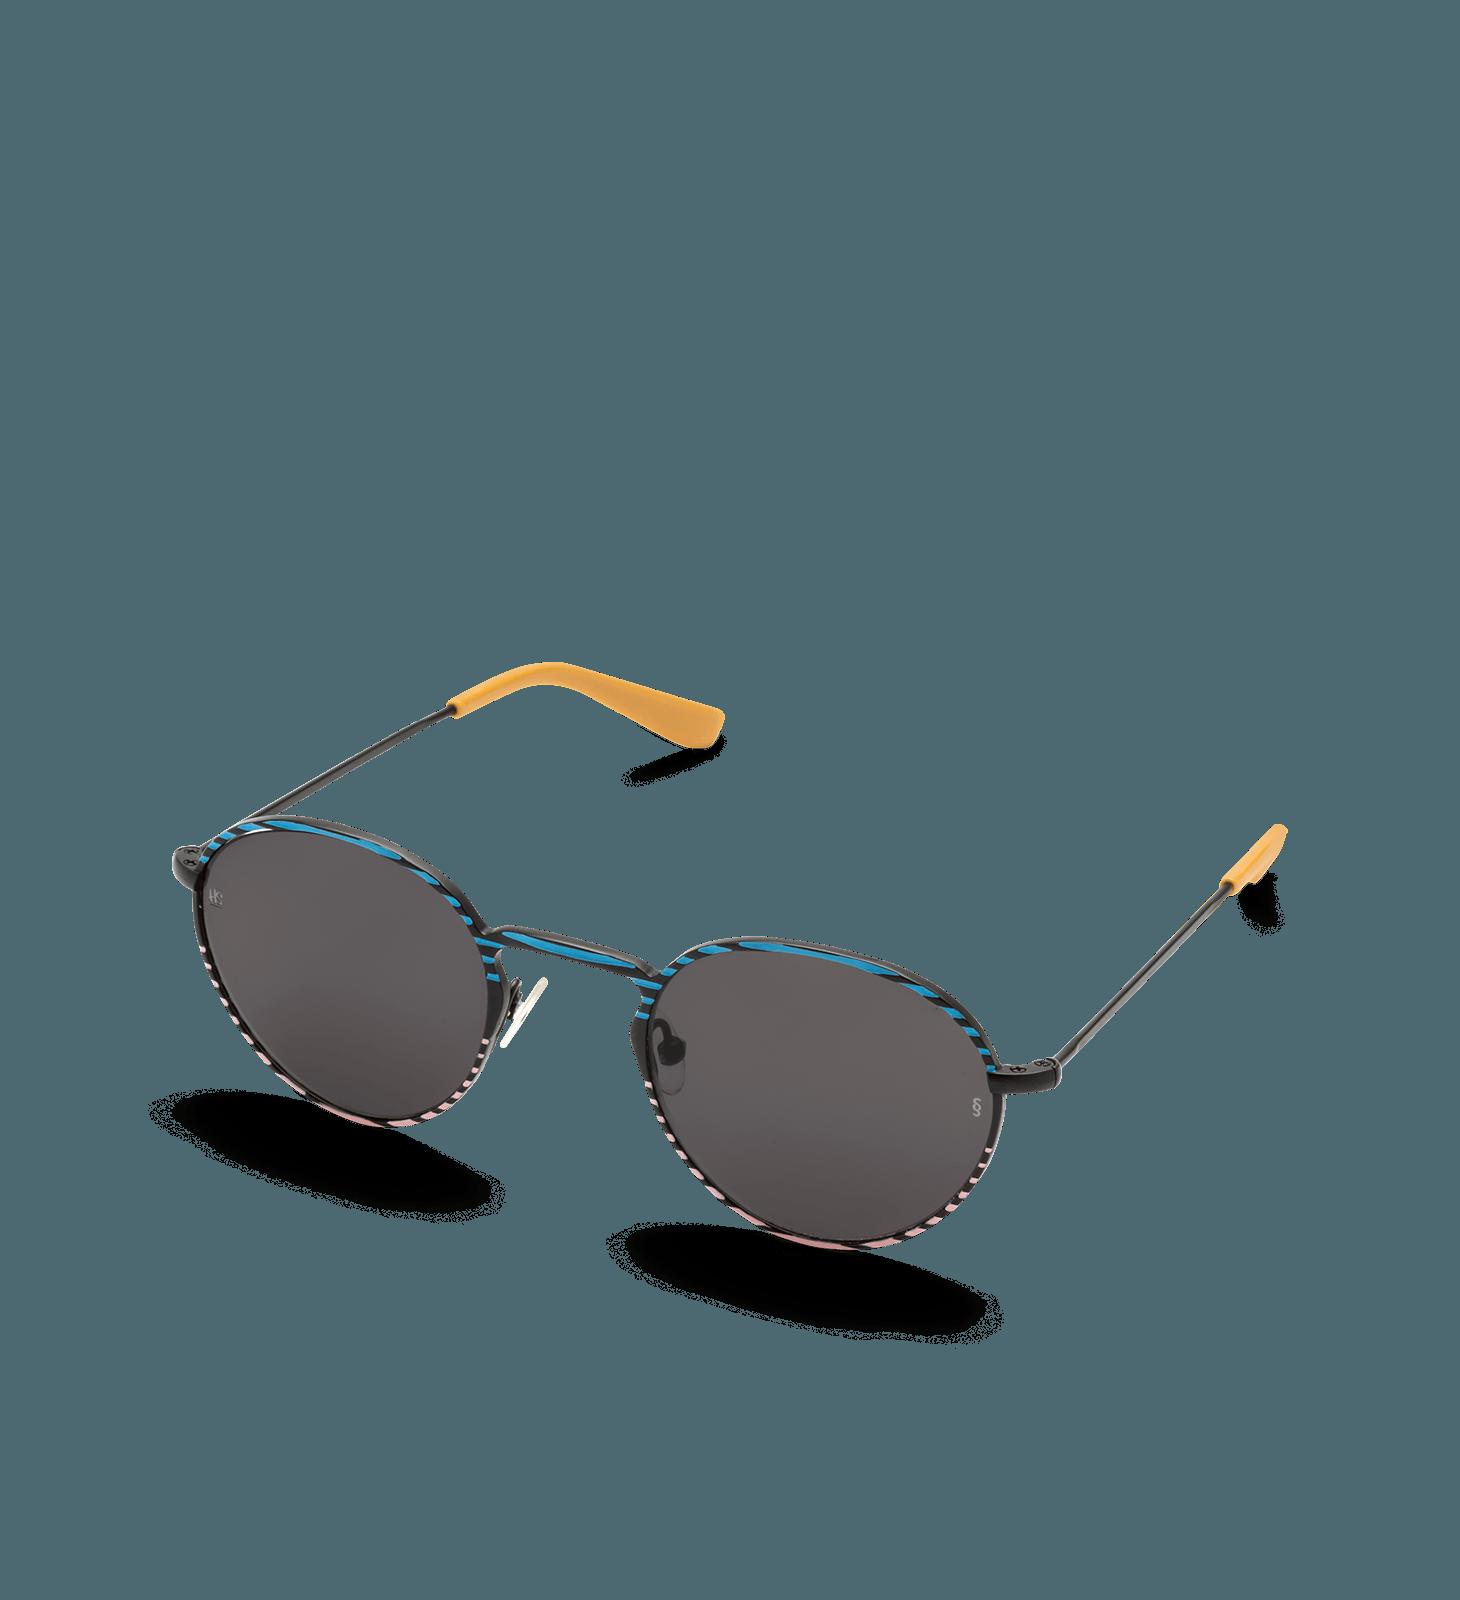 Fading Sun Sunglasses